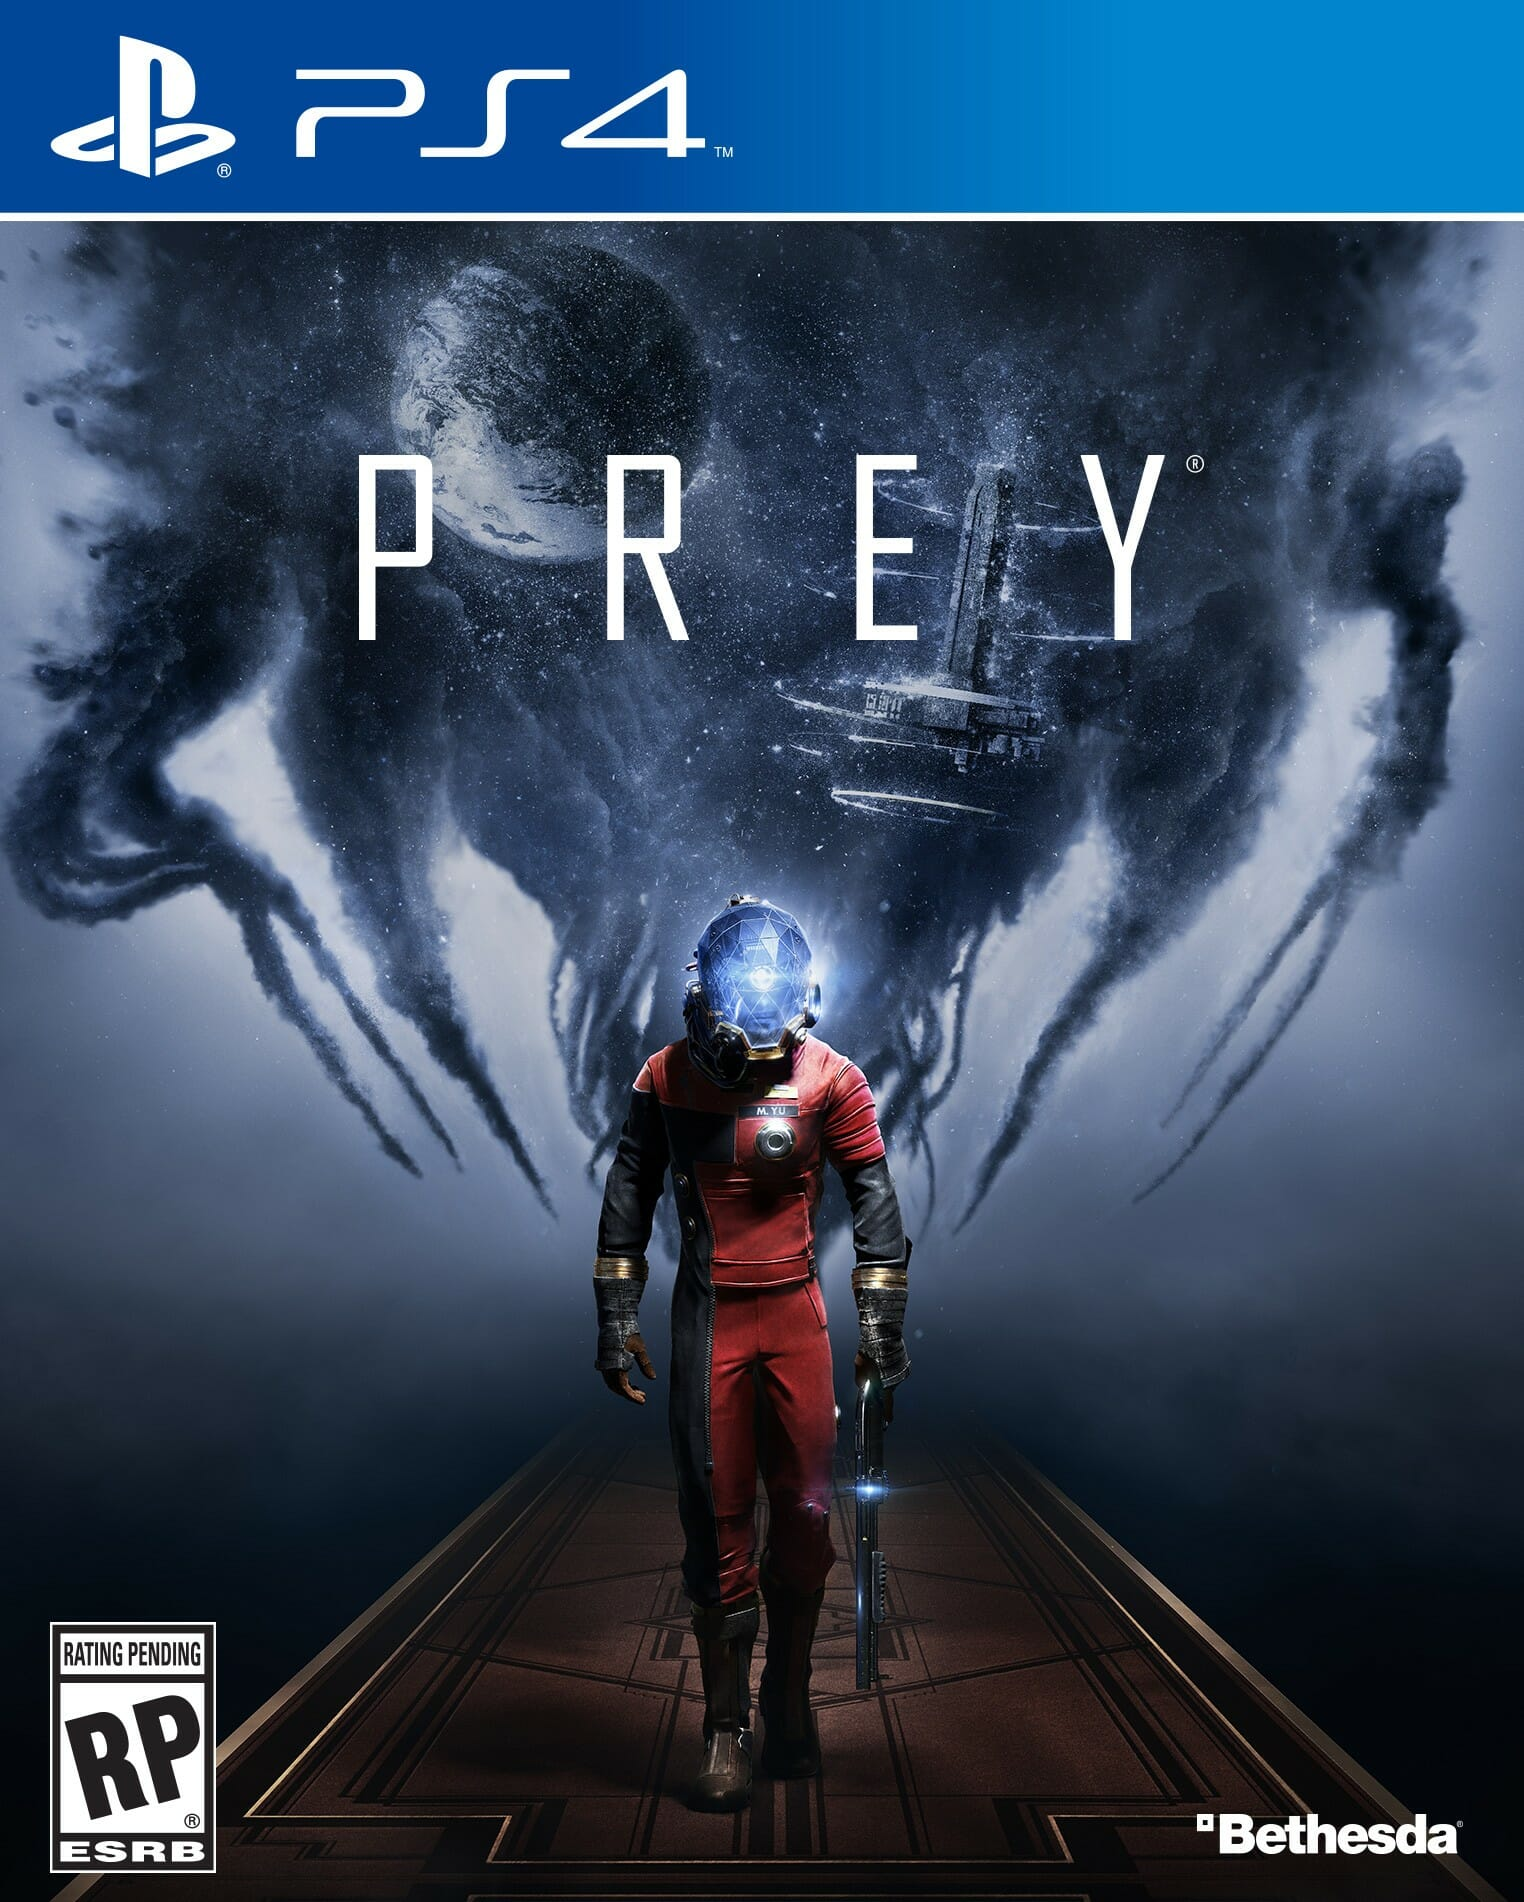 Prey Review - Stealing Genius 7